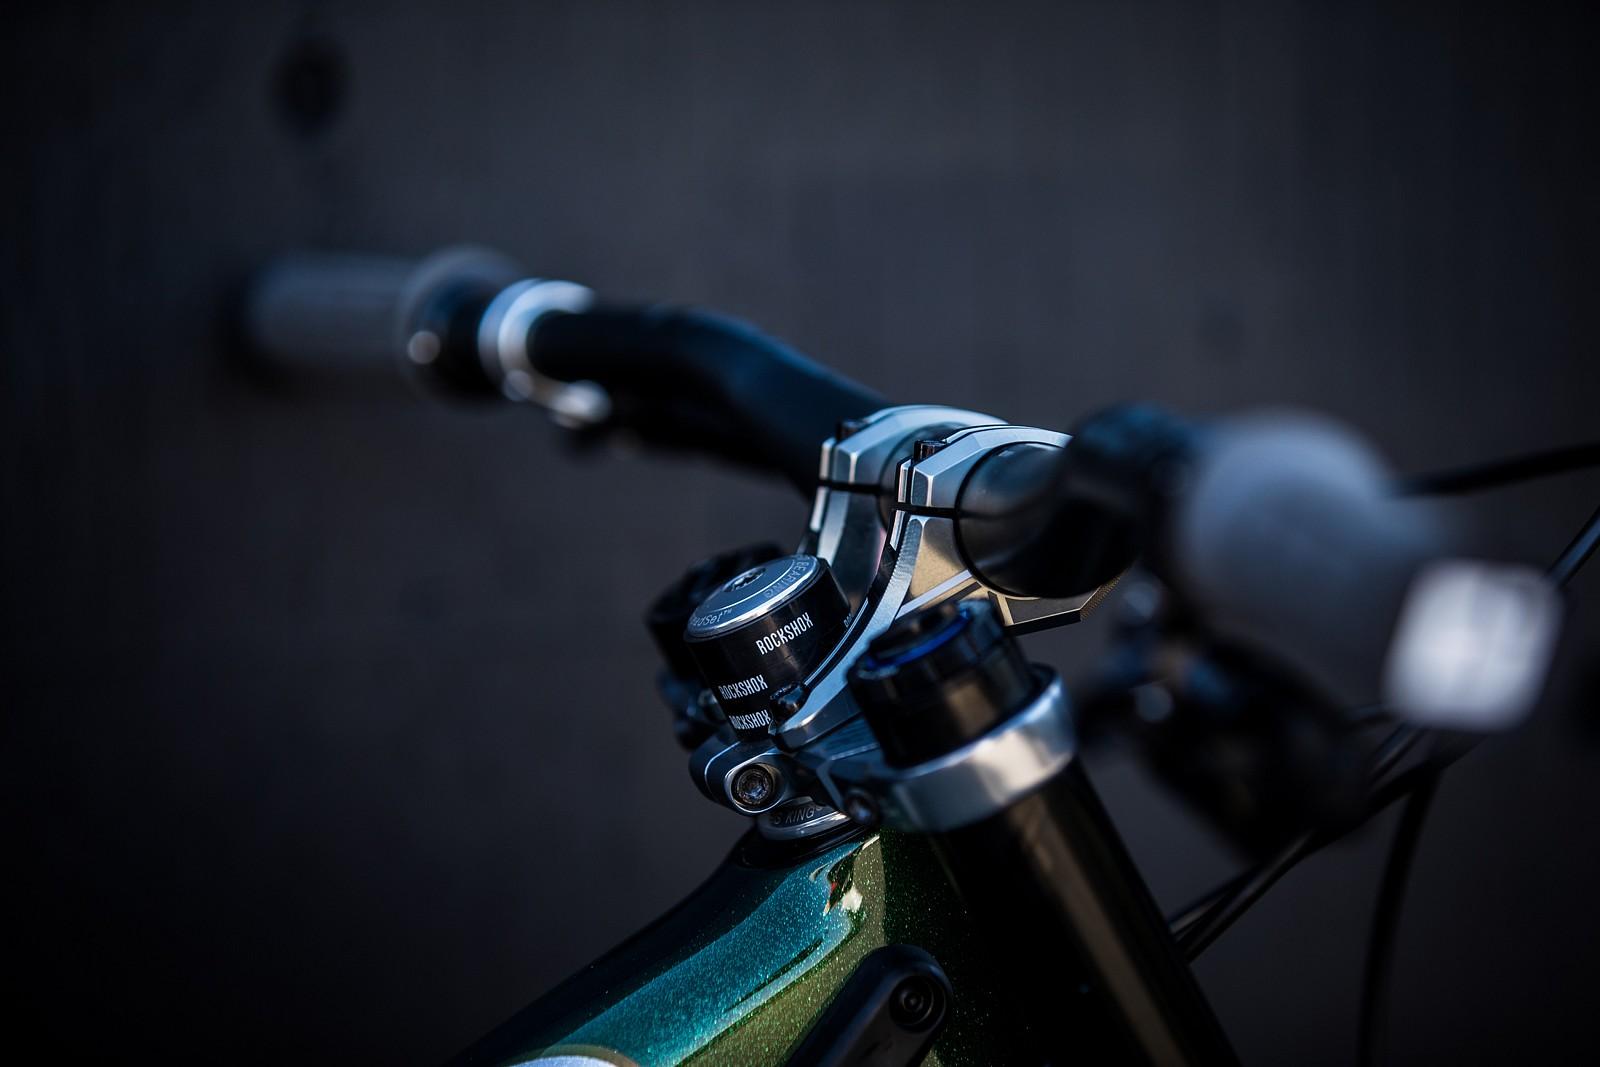 Connor Fearon's Kona Operator at 2019 Worlds MSA - Connor Fearon's Kona Operator at 2019 Worlds MSA - Mountain Biking Pictures - Vital MTB